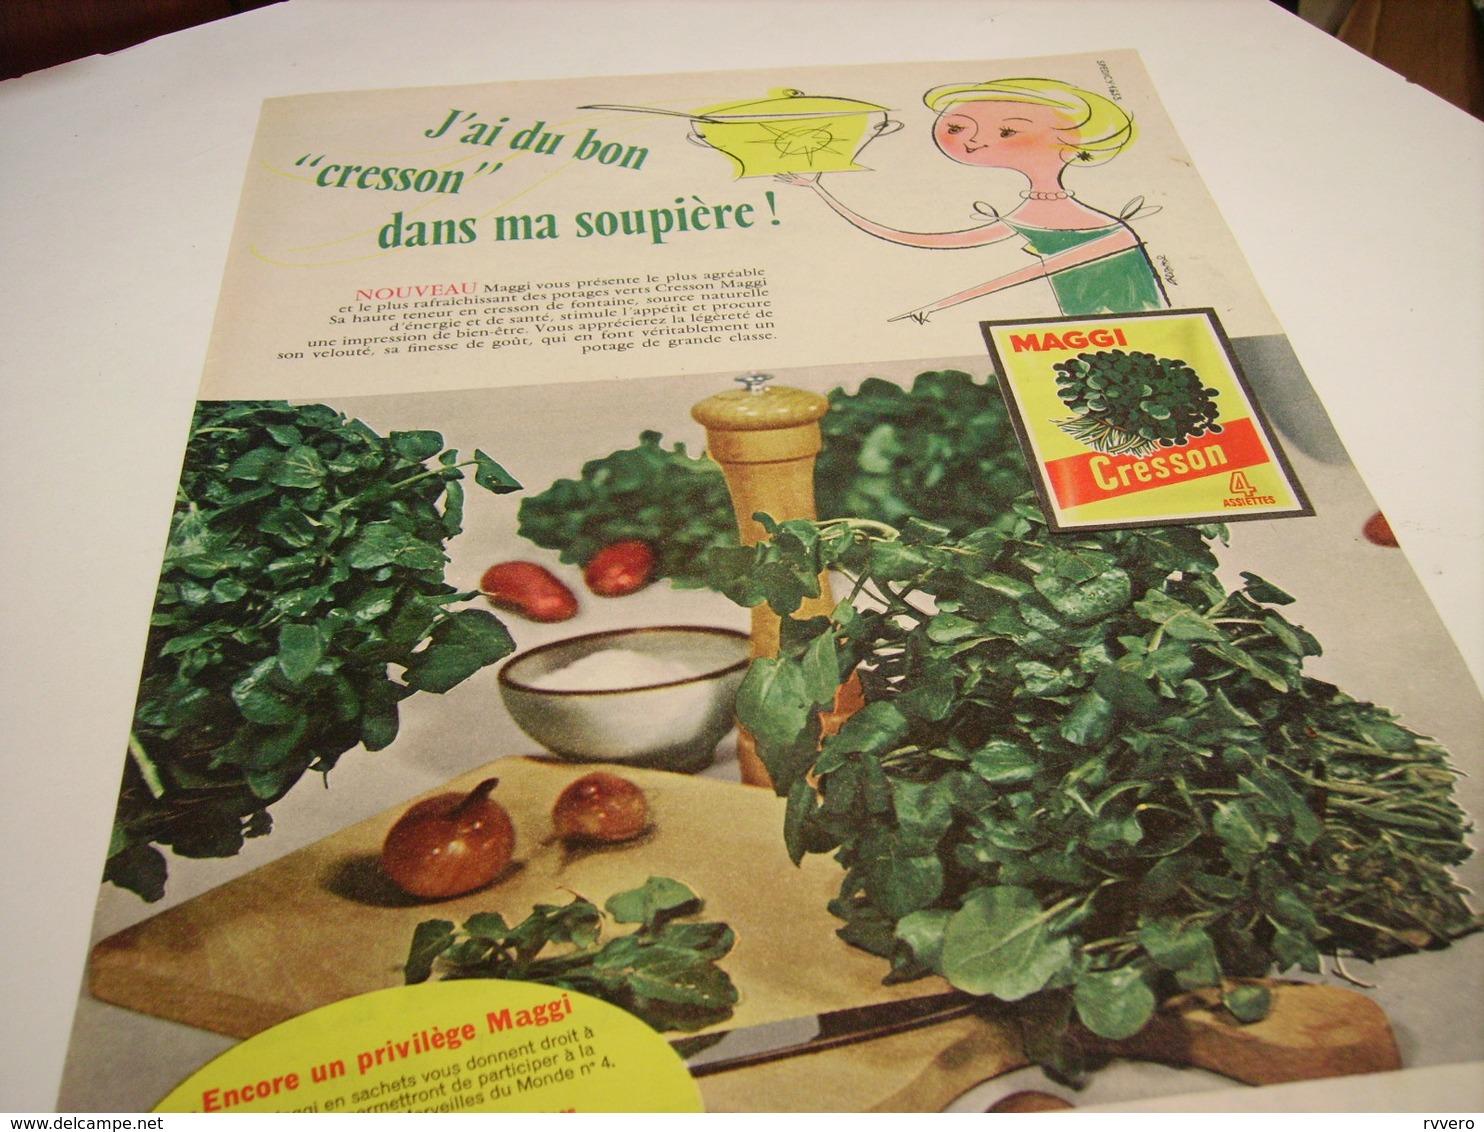 ANCIENNE AFFICHEPUBLICITE CRESSON DANS MA SOUPIERE  MAGGI 1958 - Advertising